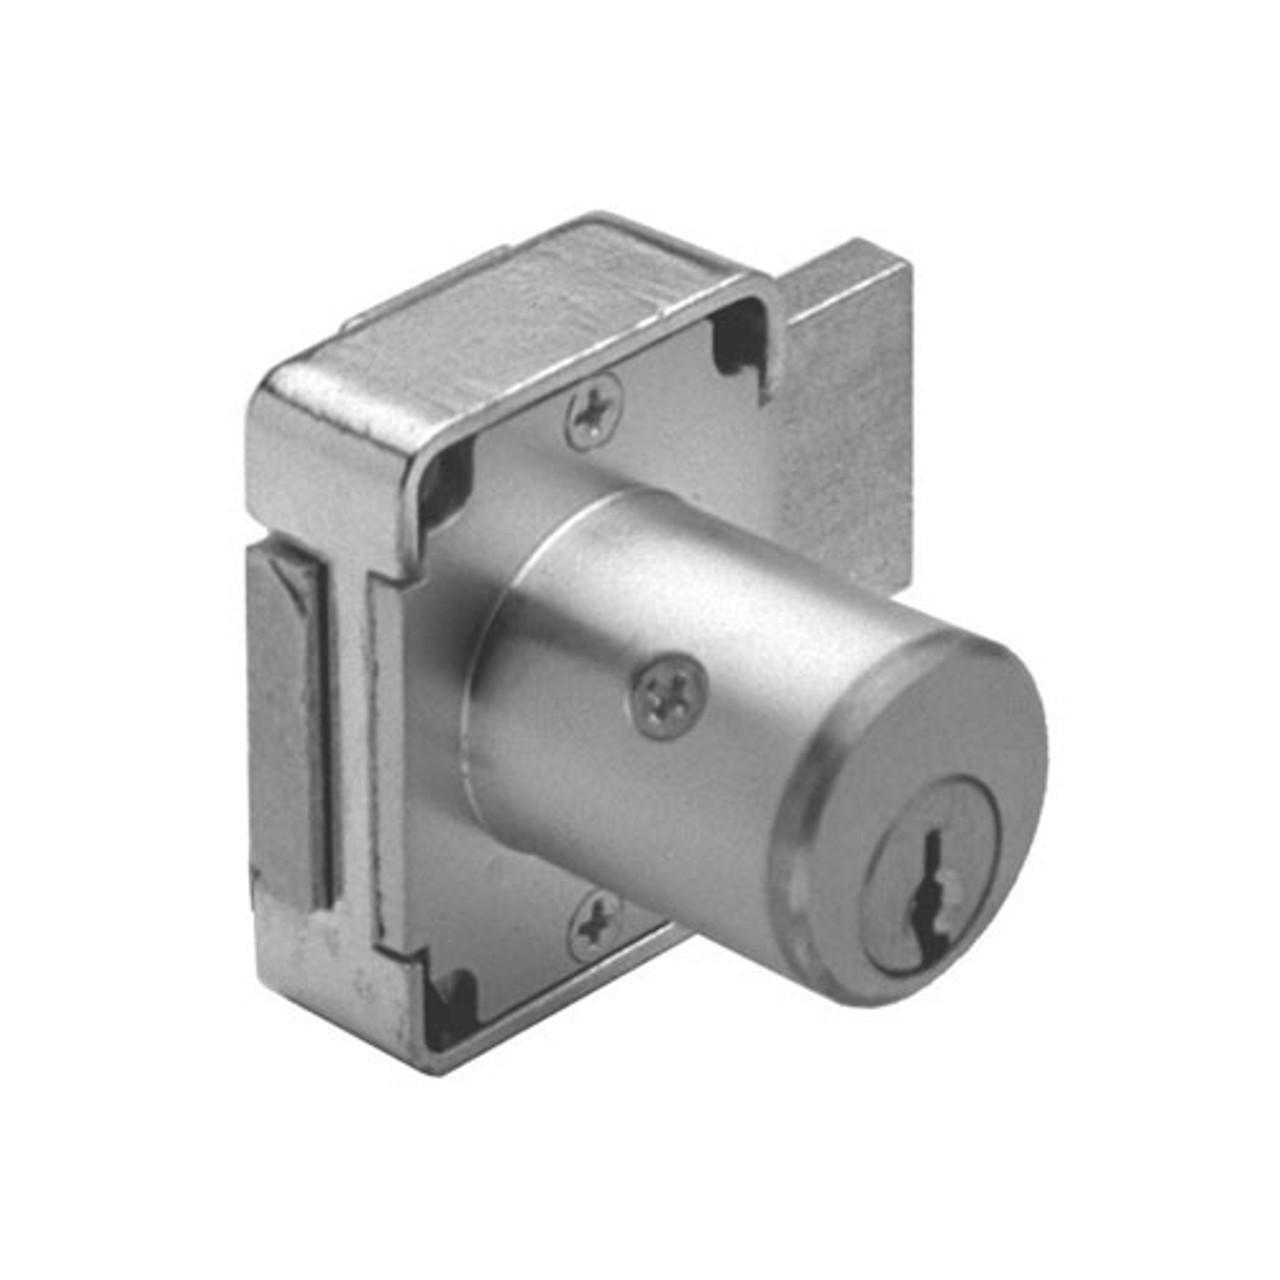 Olympus 100DR-KA107-26D-7/8 Deadbolt Locks in Satin Chrome Finish